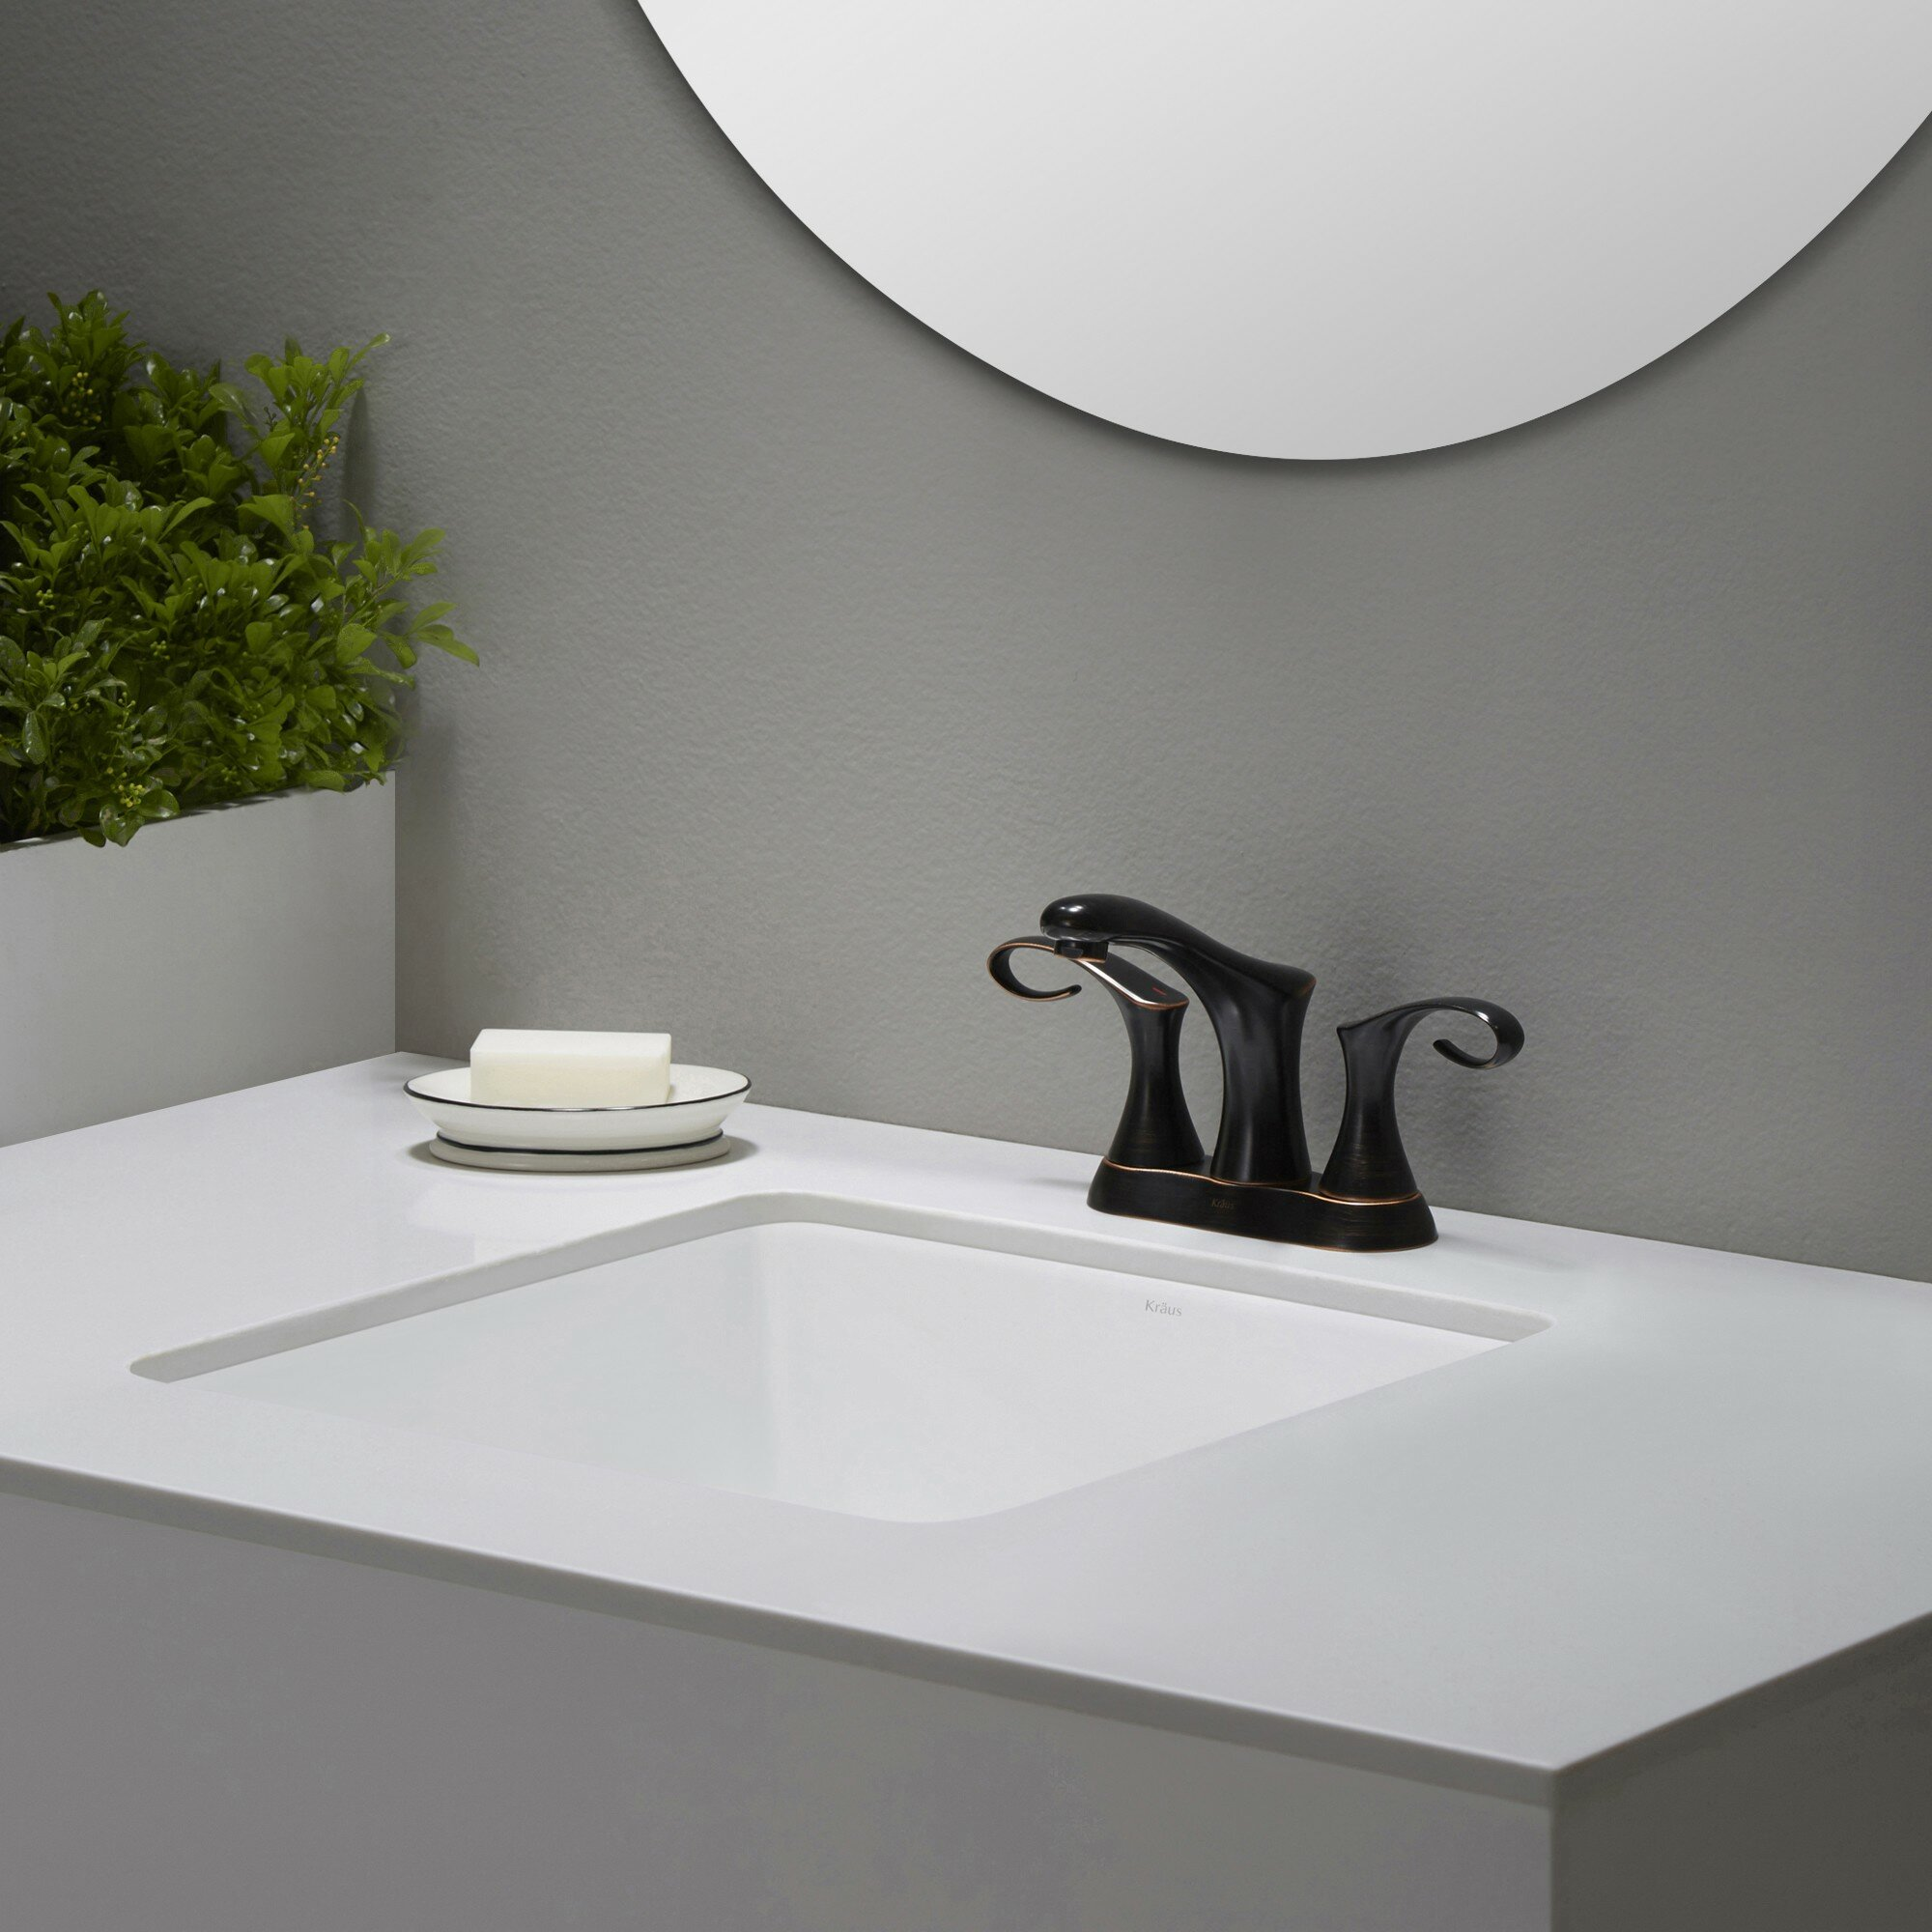 Kraus Elavo Ceramic Square Undermount Bathroom Sink With